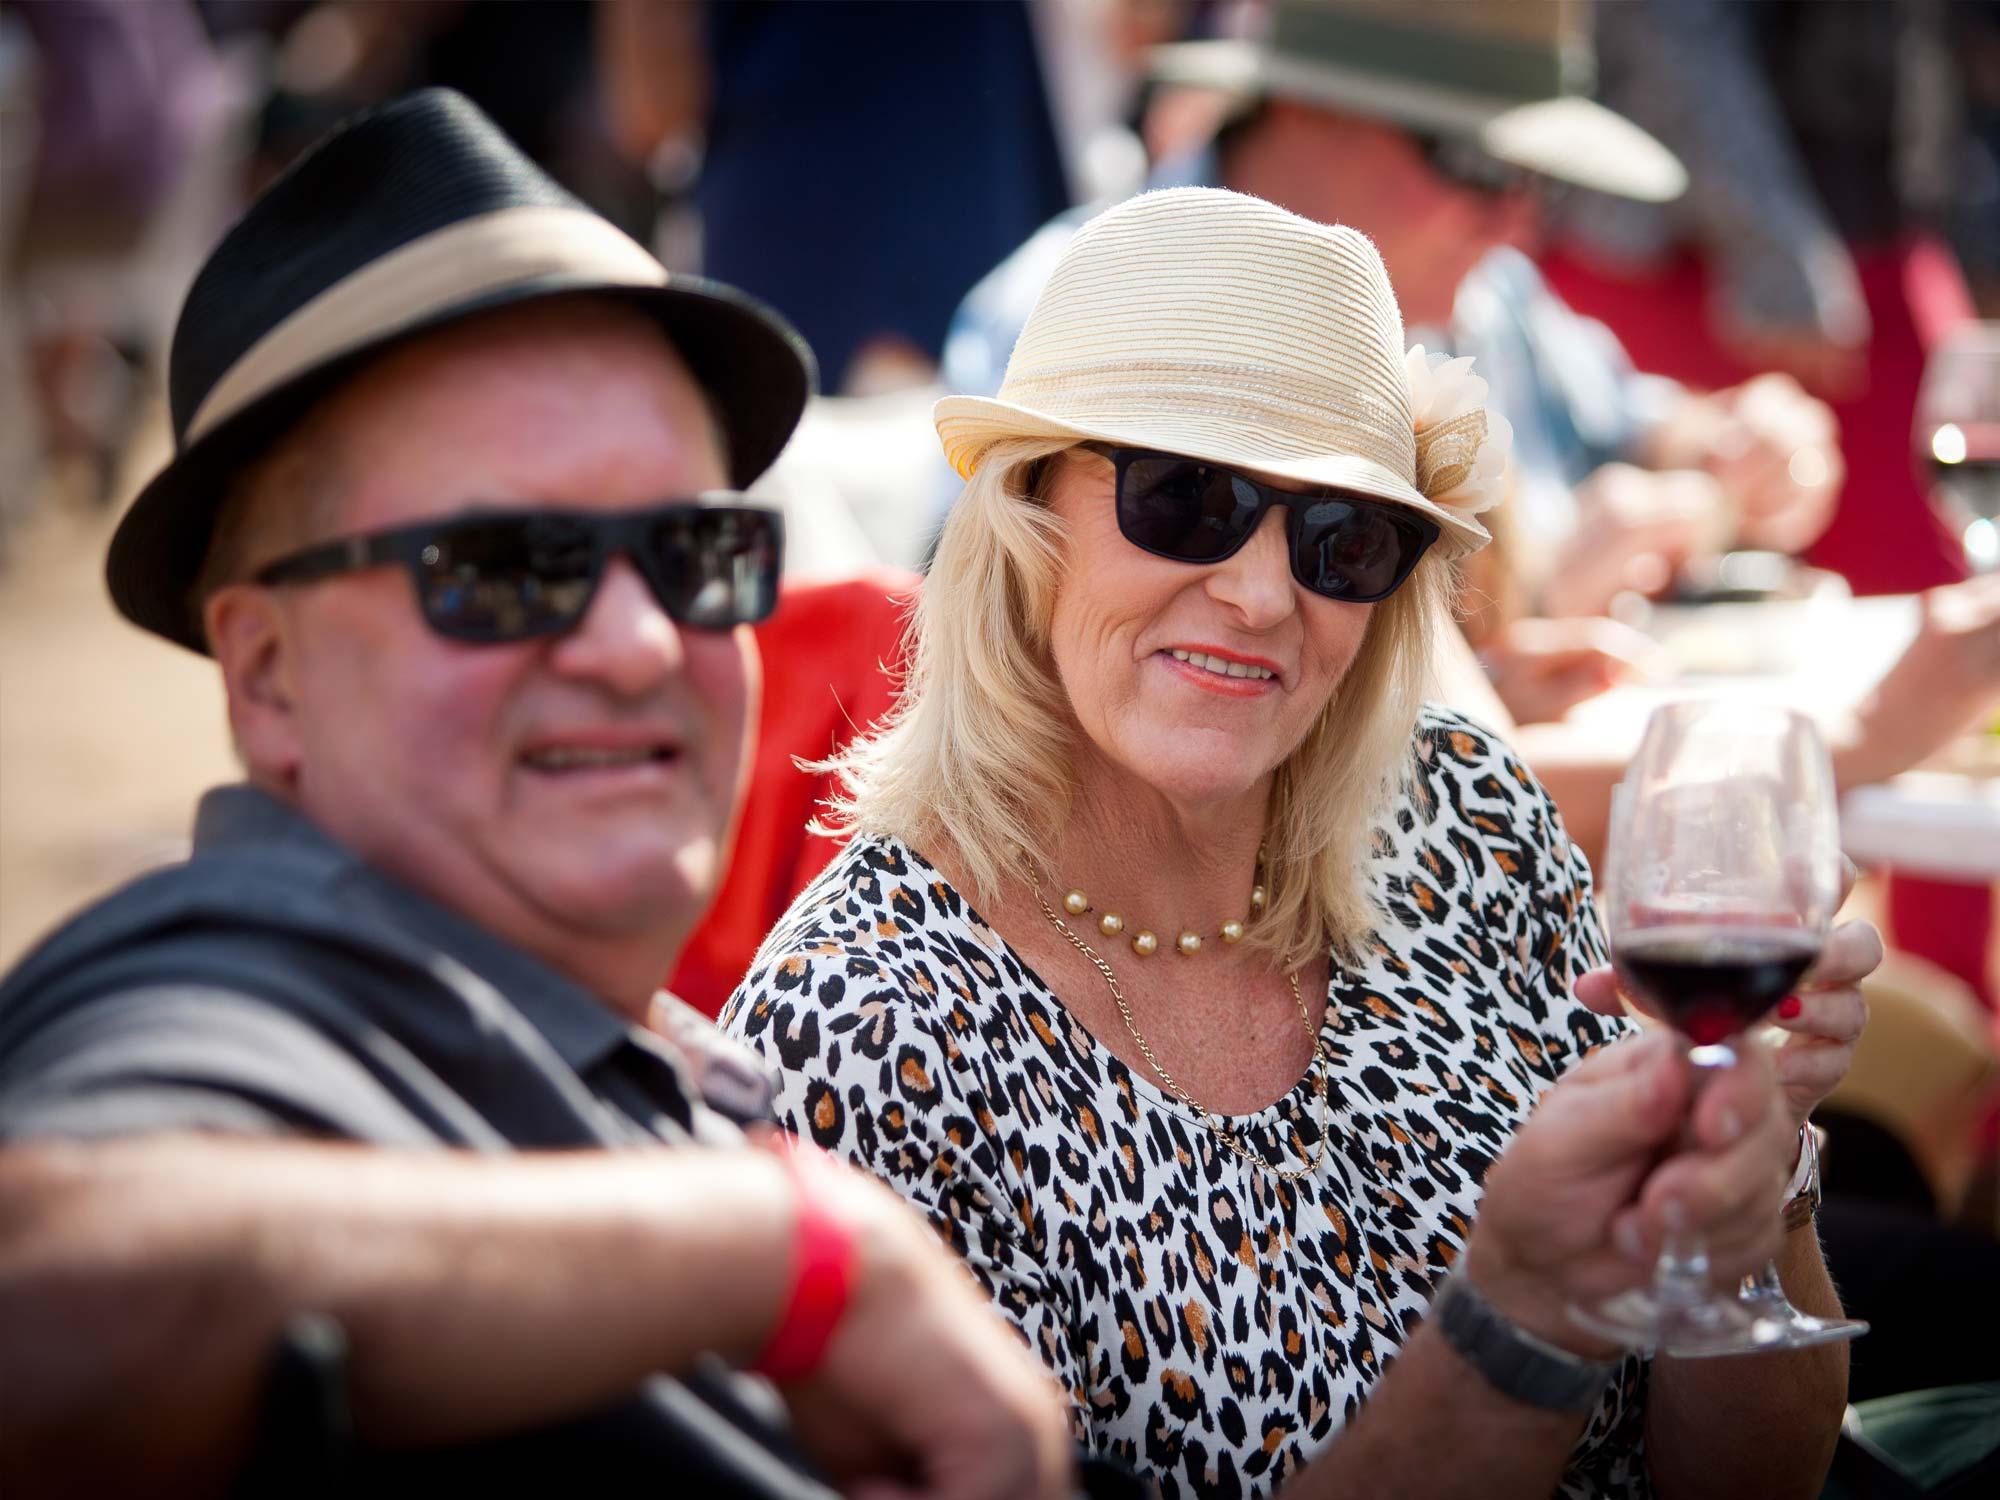 bendigo-winegrowers_blog_broadsheet-melbourne.jpg